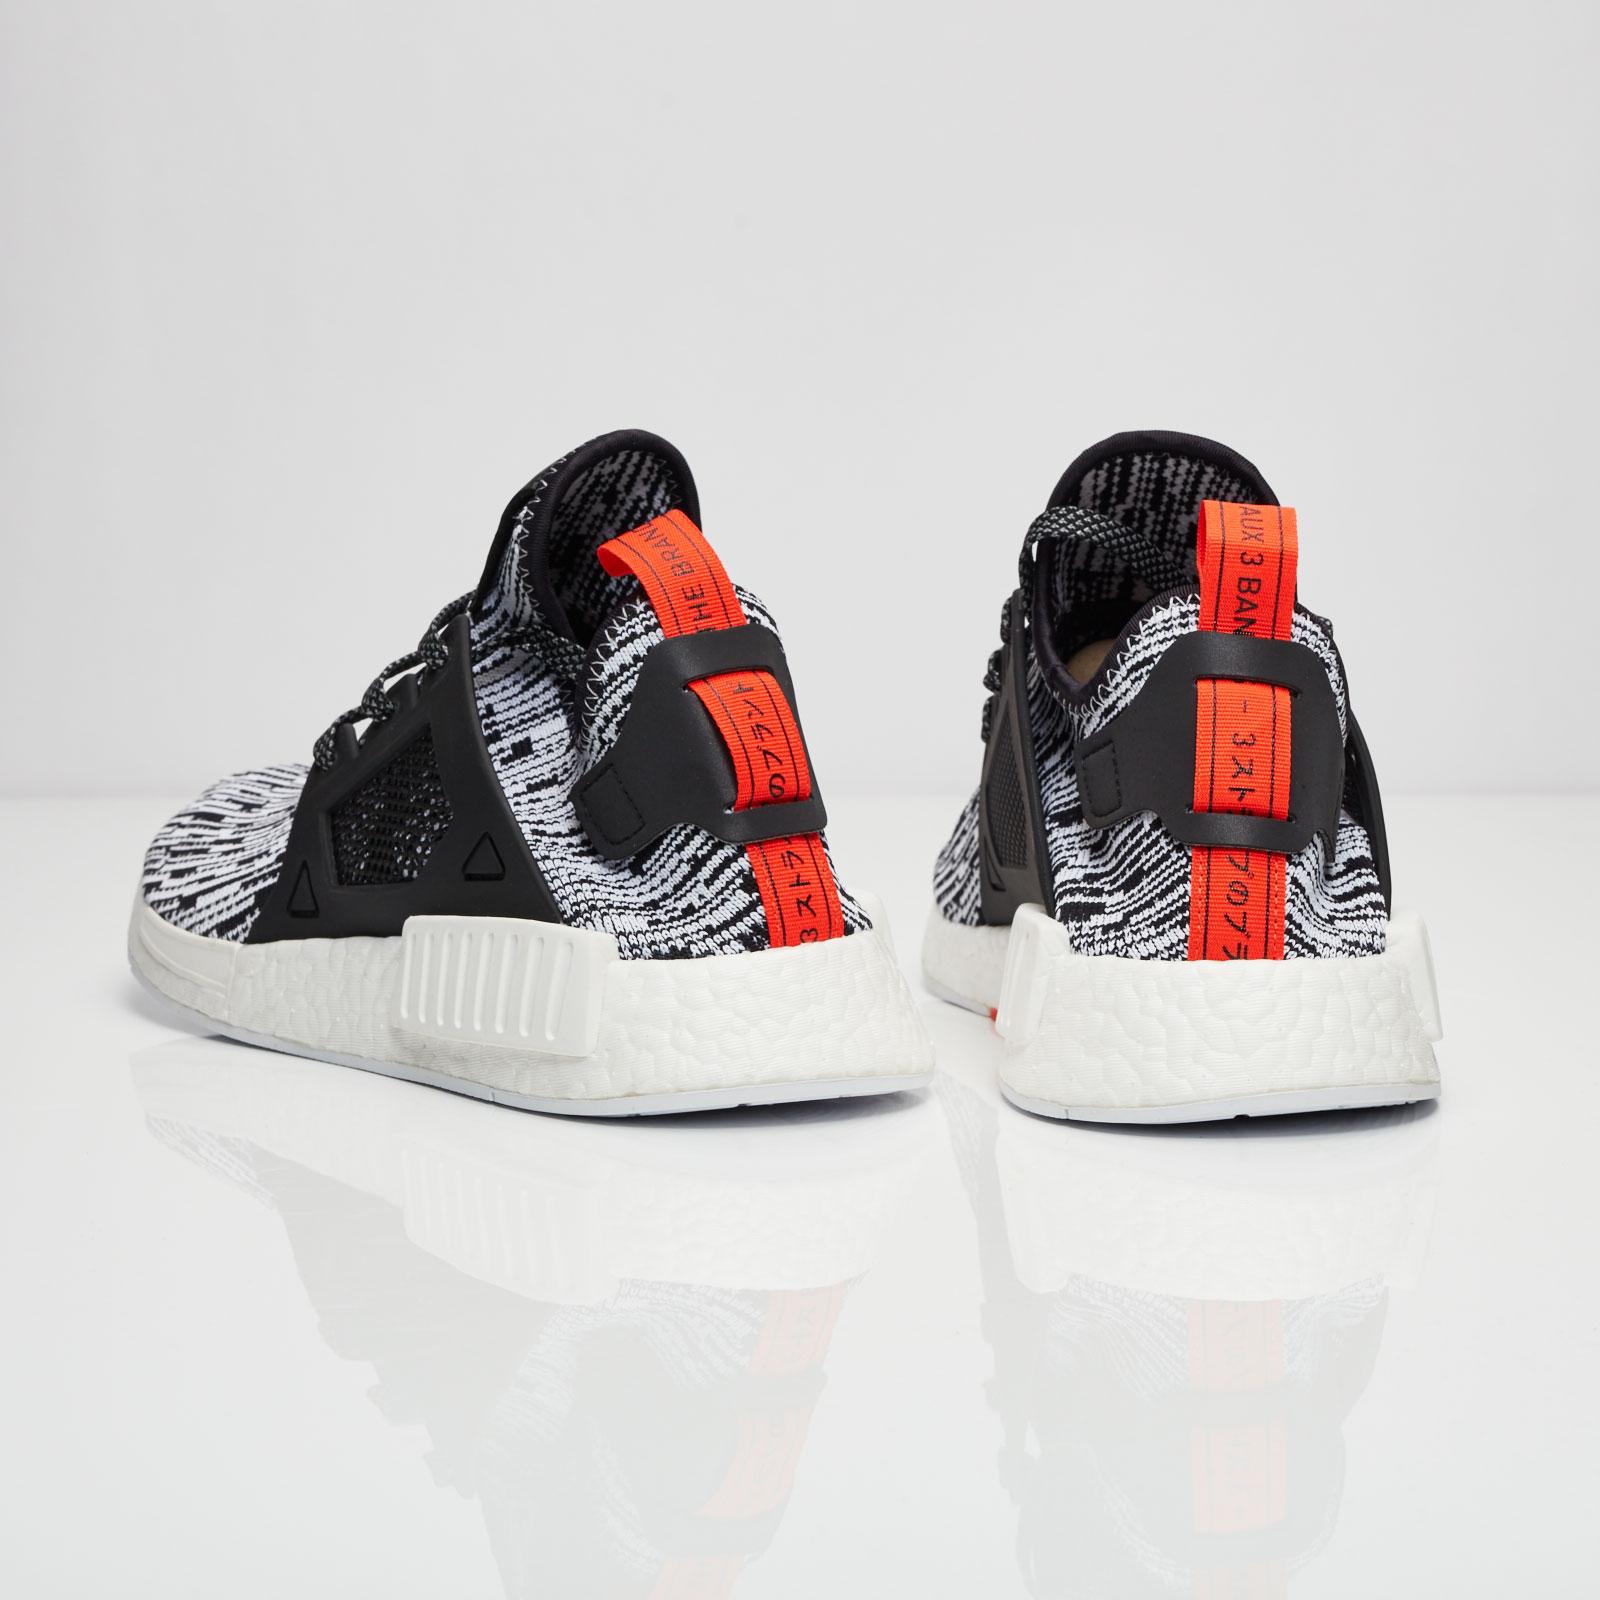 21d12966b adidas NMD XR1 PK - S32216 - Sneakersnstuff